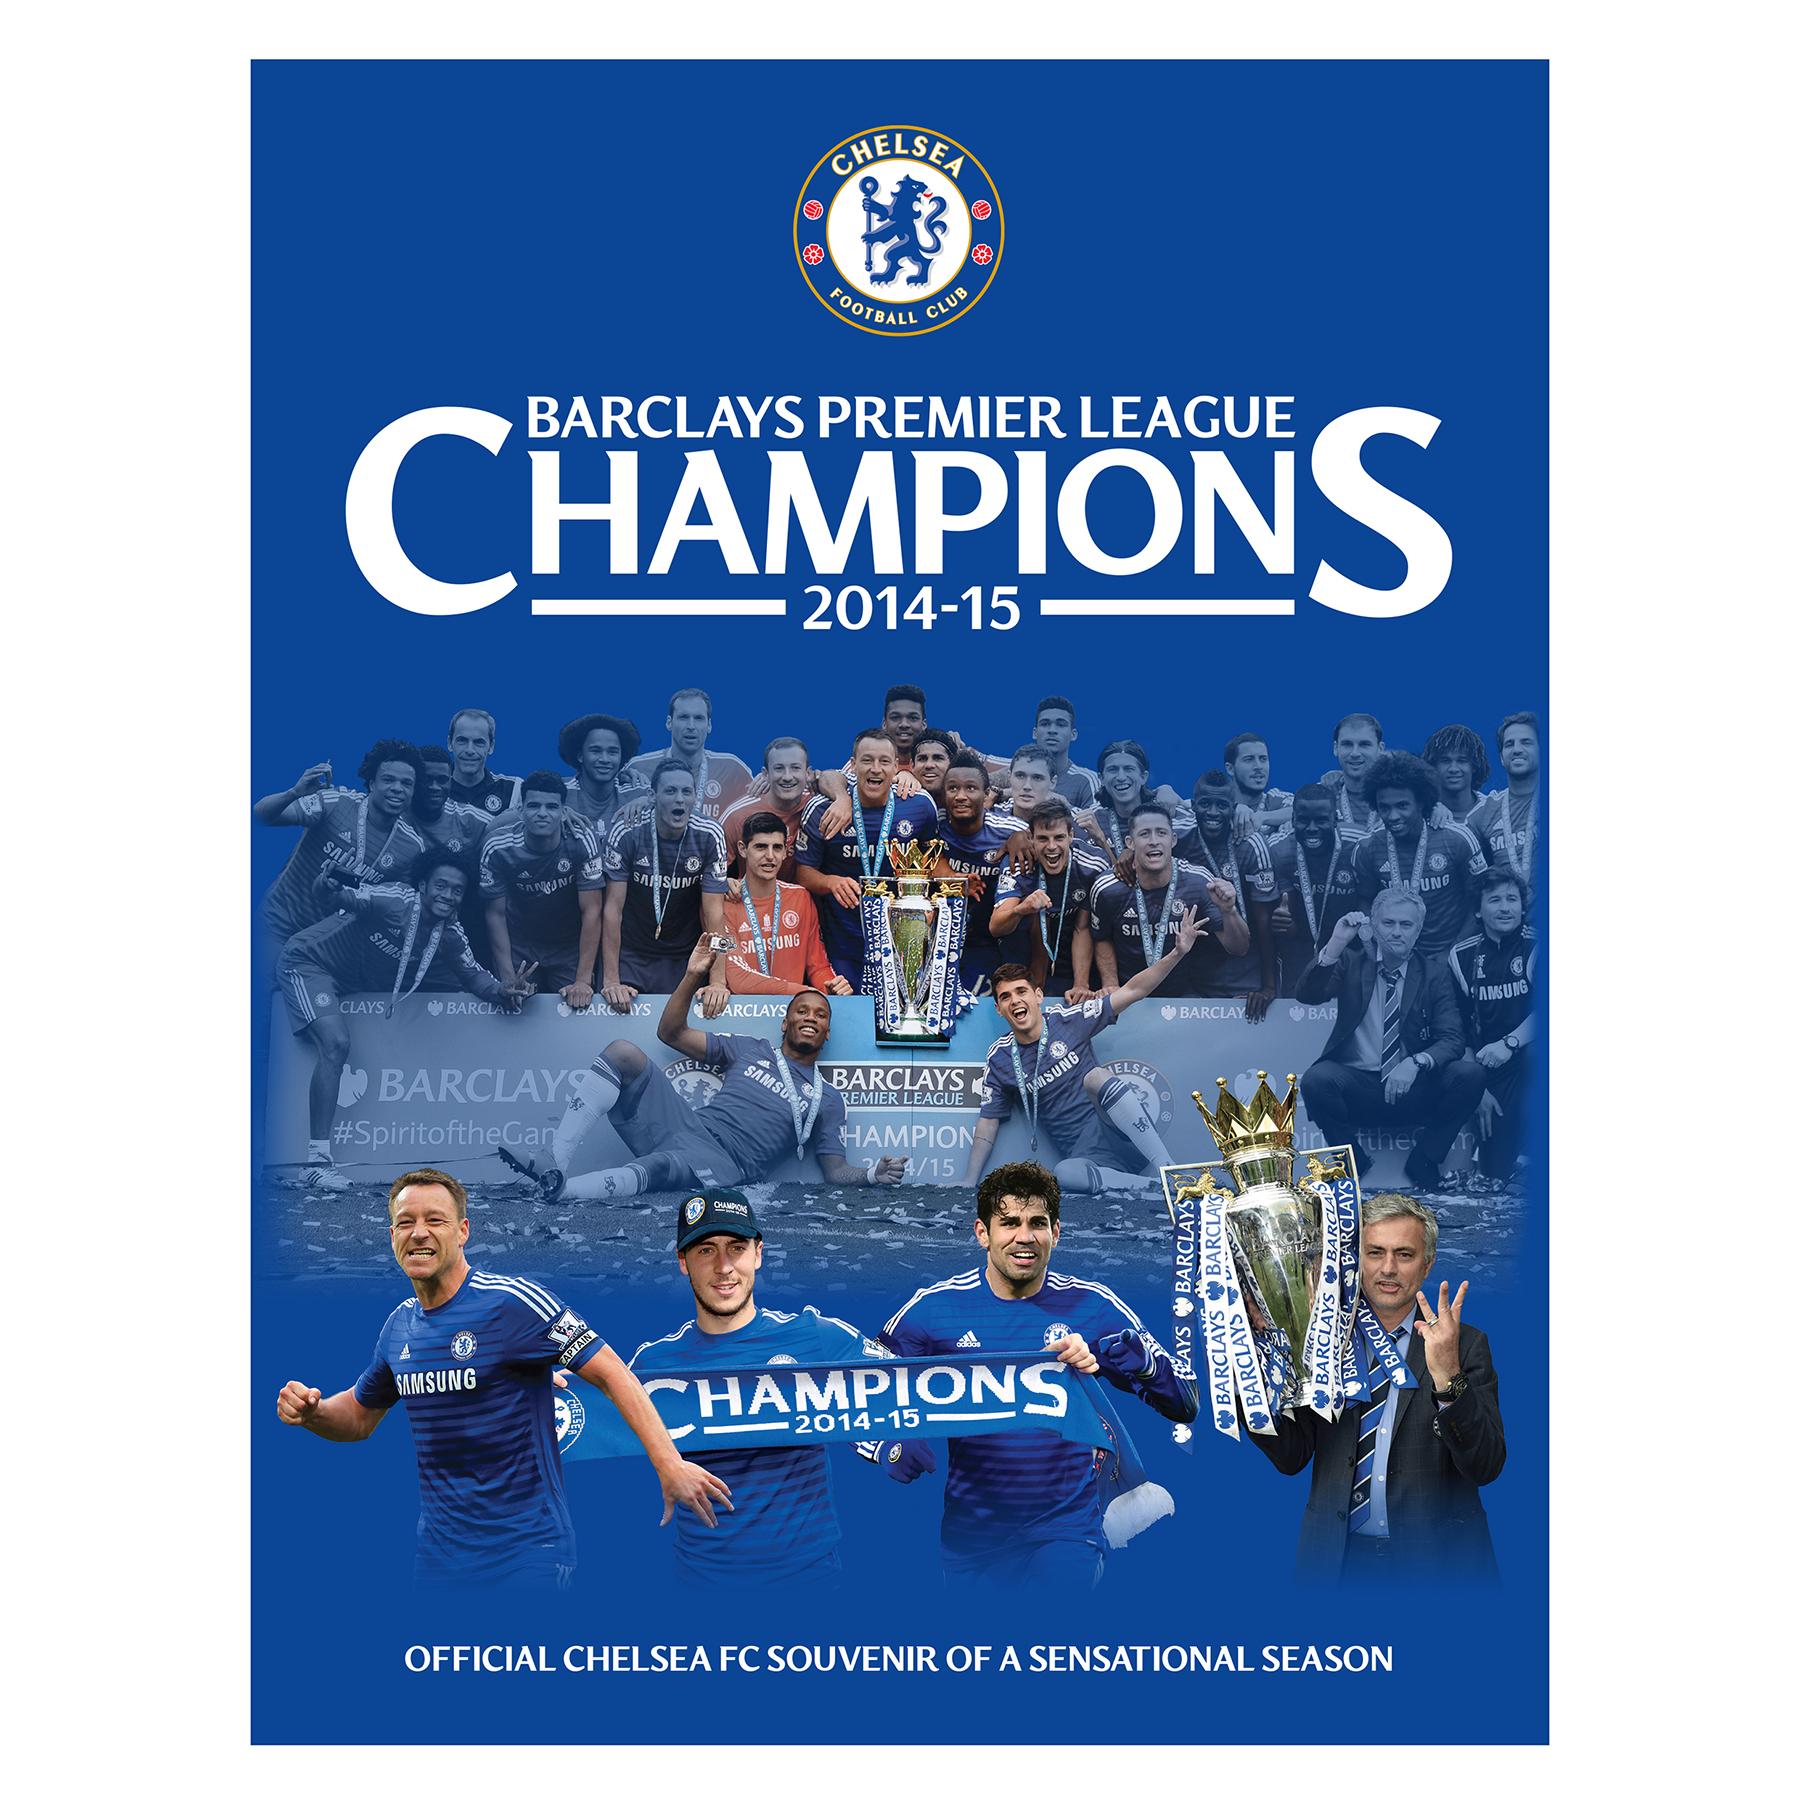 Chelsea 2014/15 Champions Book - Hard Back